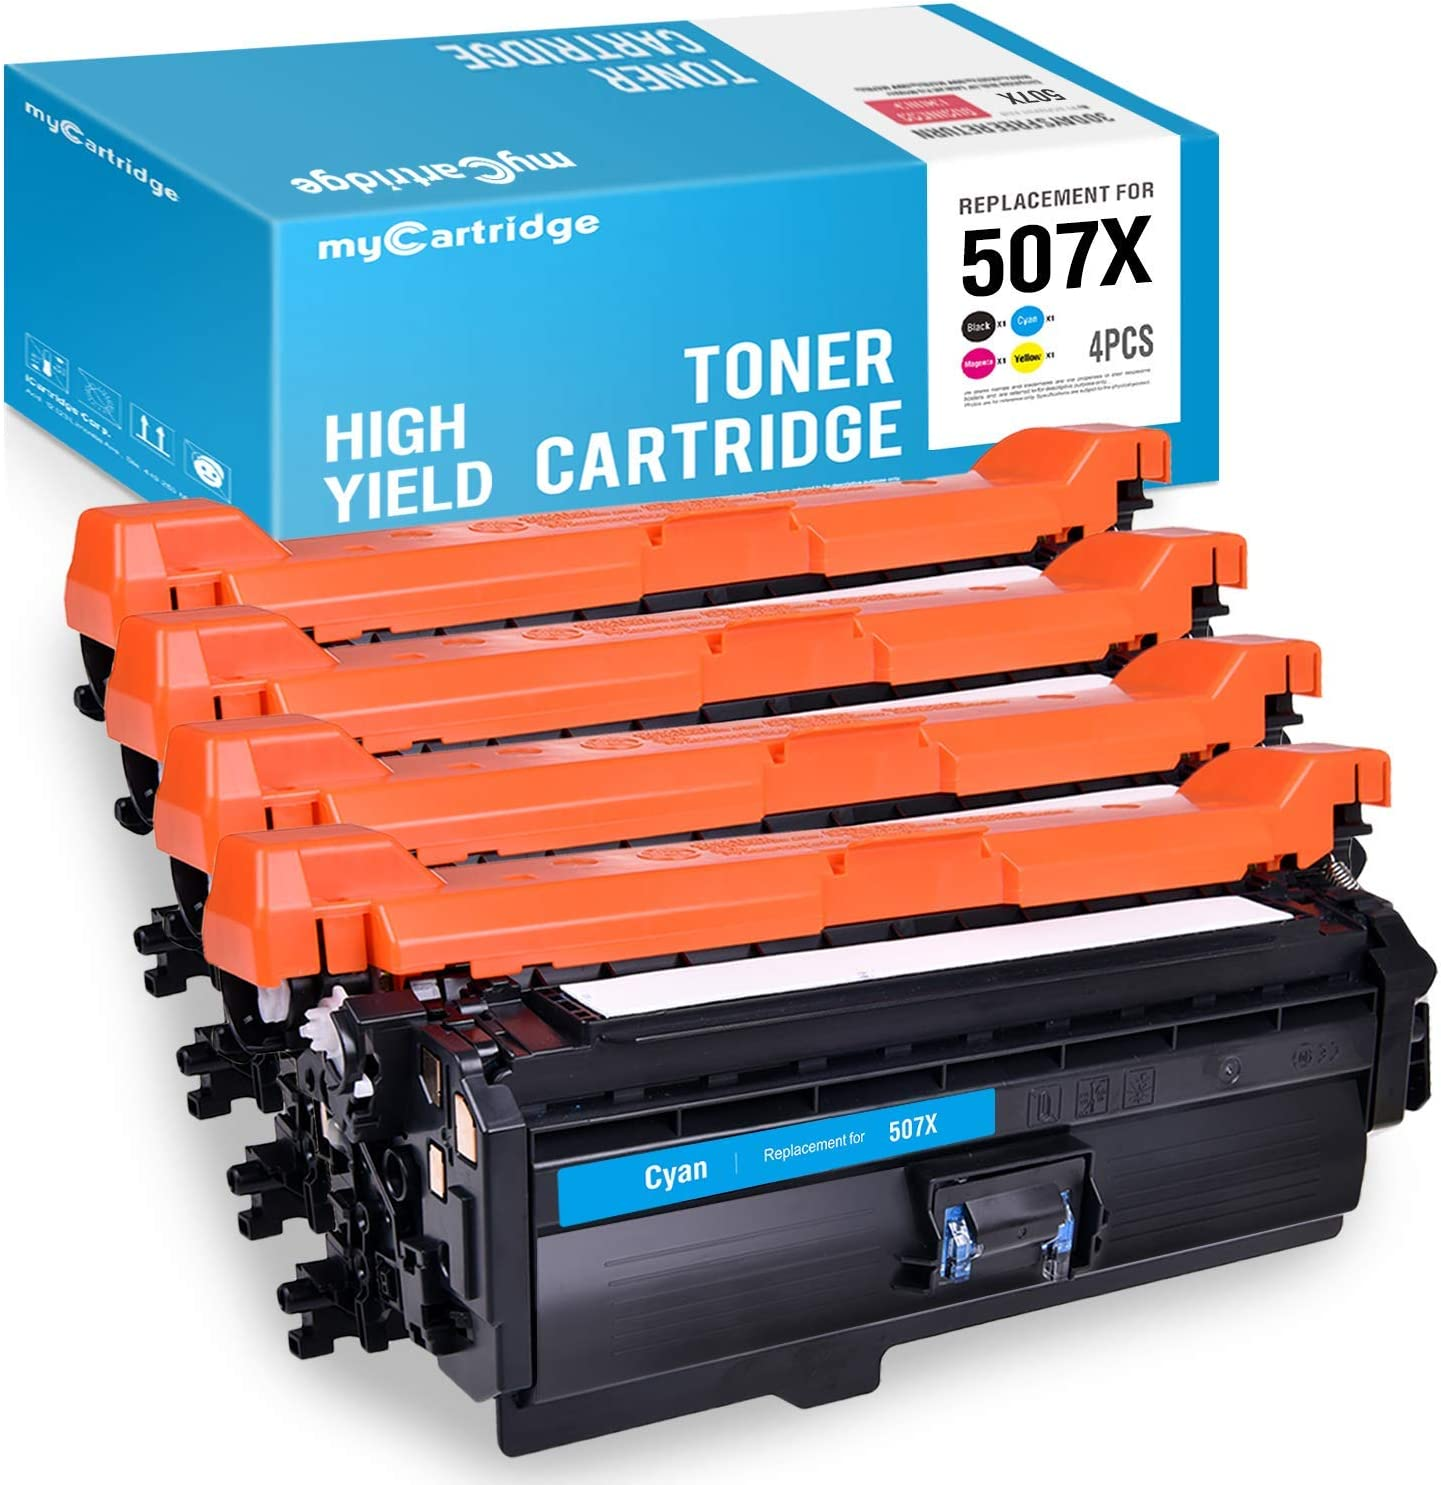 myCartridge Remanufactured Toner Cartridge Replacement for HP 507X 507A CE400X CE401A CE403A CE402A (Black Cyan Magenta Yellow, 4-Pack) Fit HP Laserjet Enterprise M551dn M551n MFP M575dn M575F M570dn